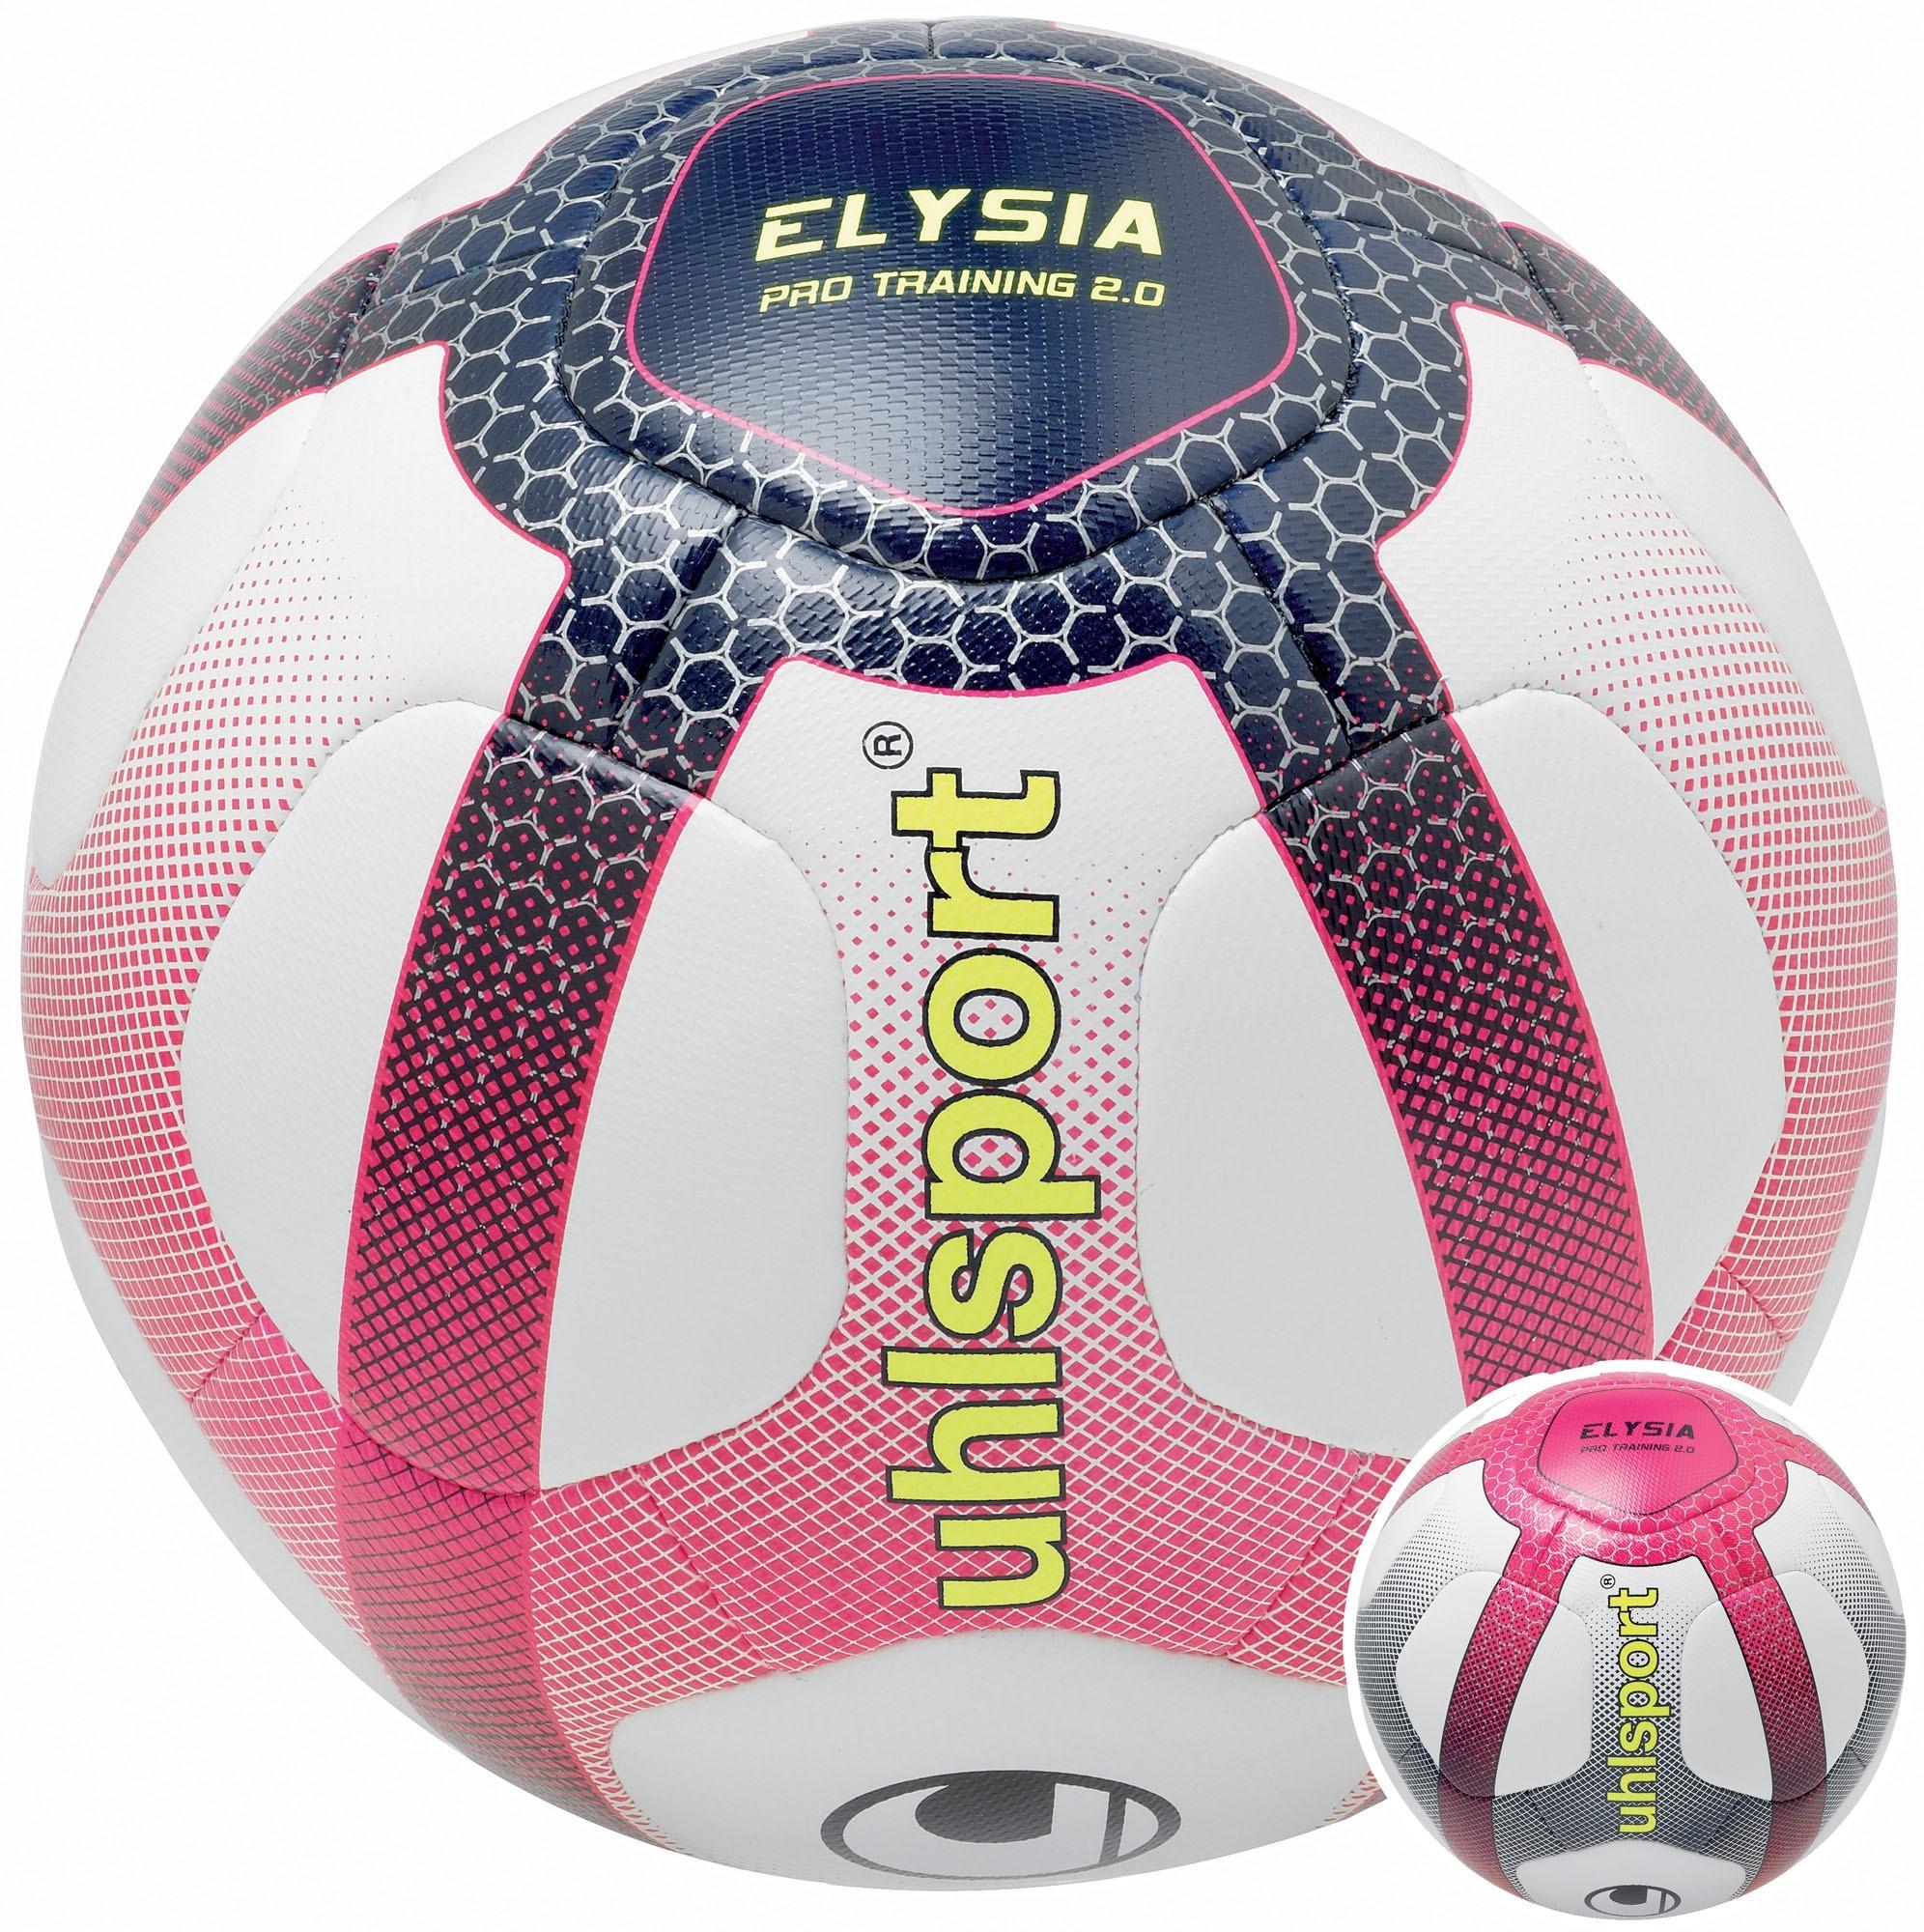 Ballon Elysia Pro Training 2.0